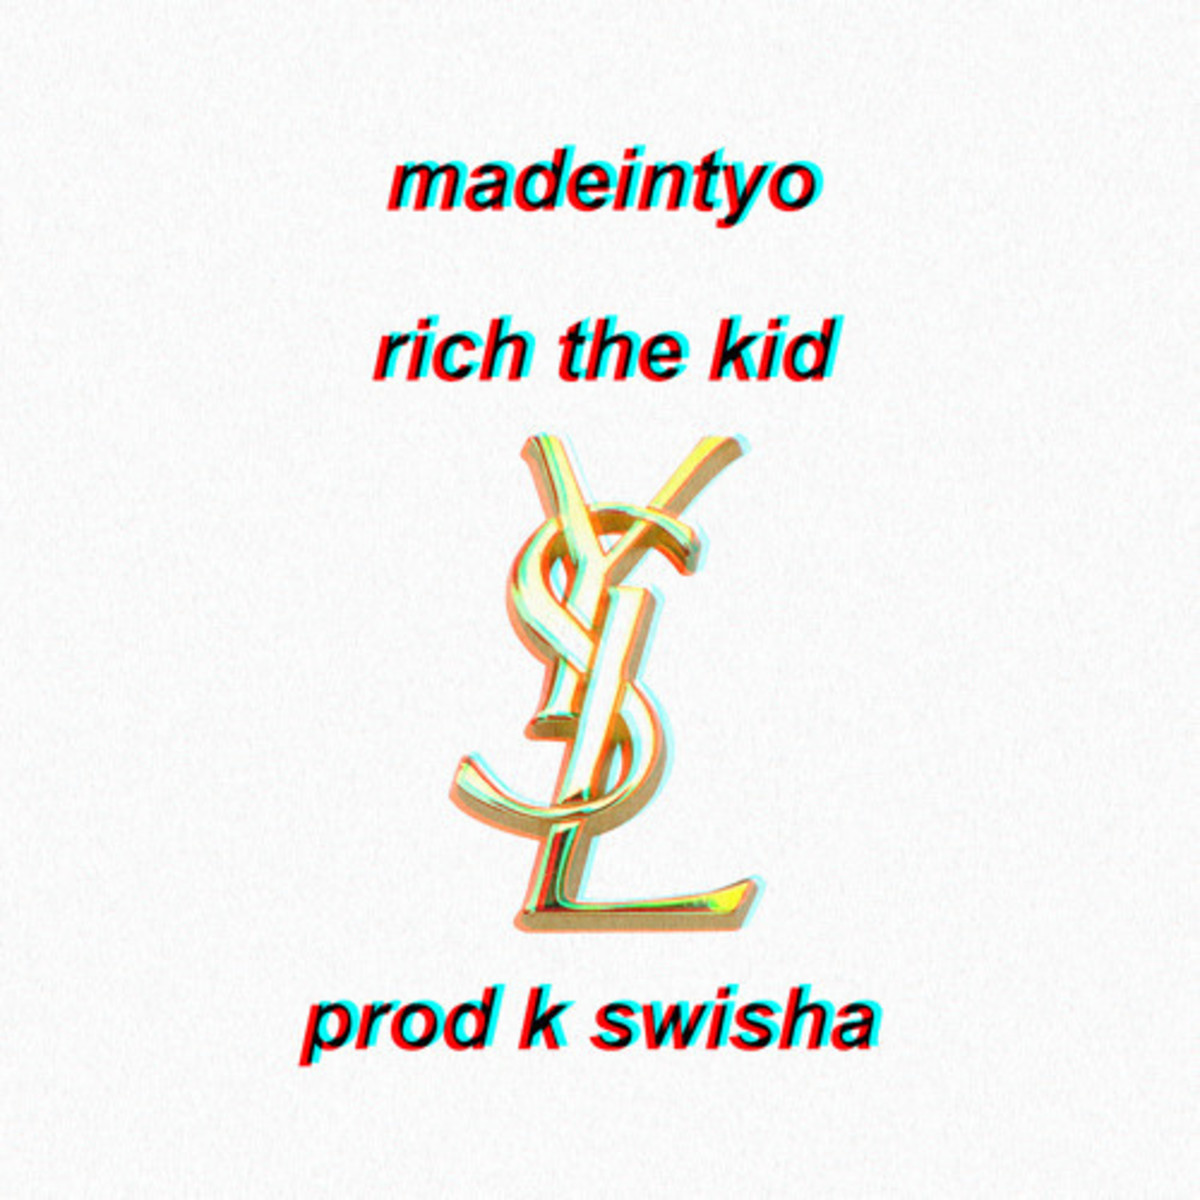 madeintyo-ysl.jpg